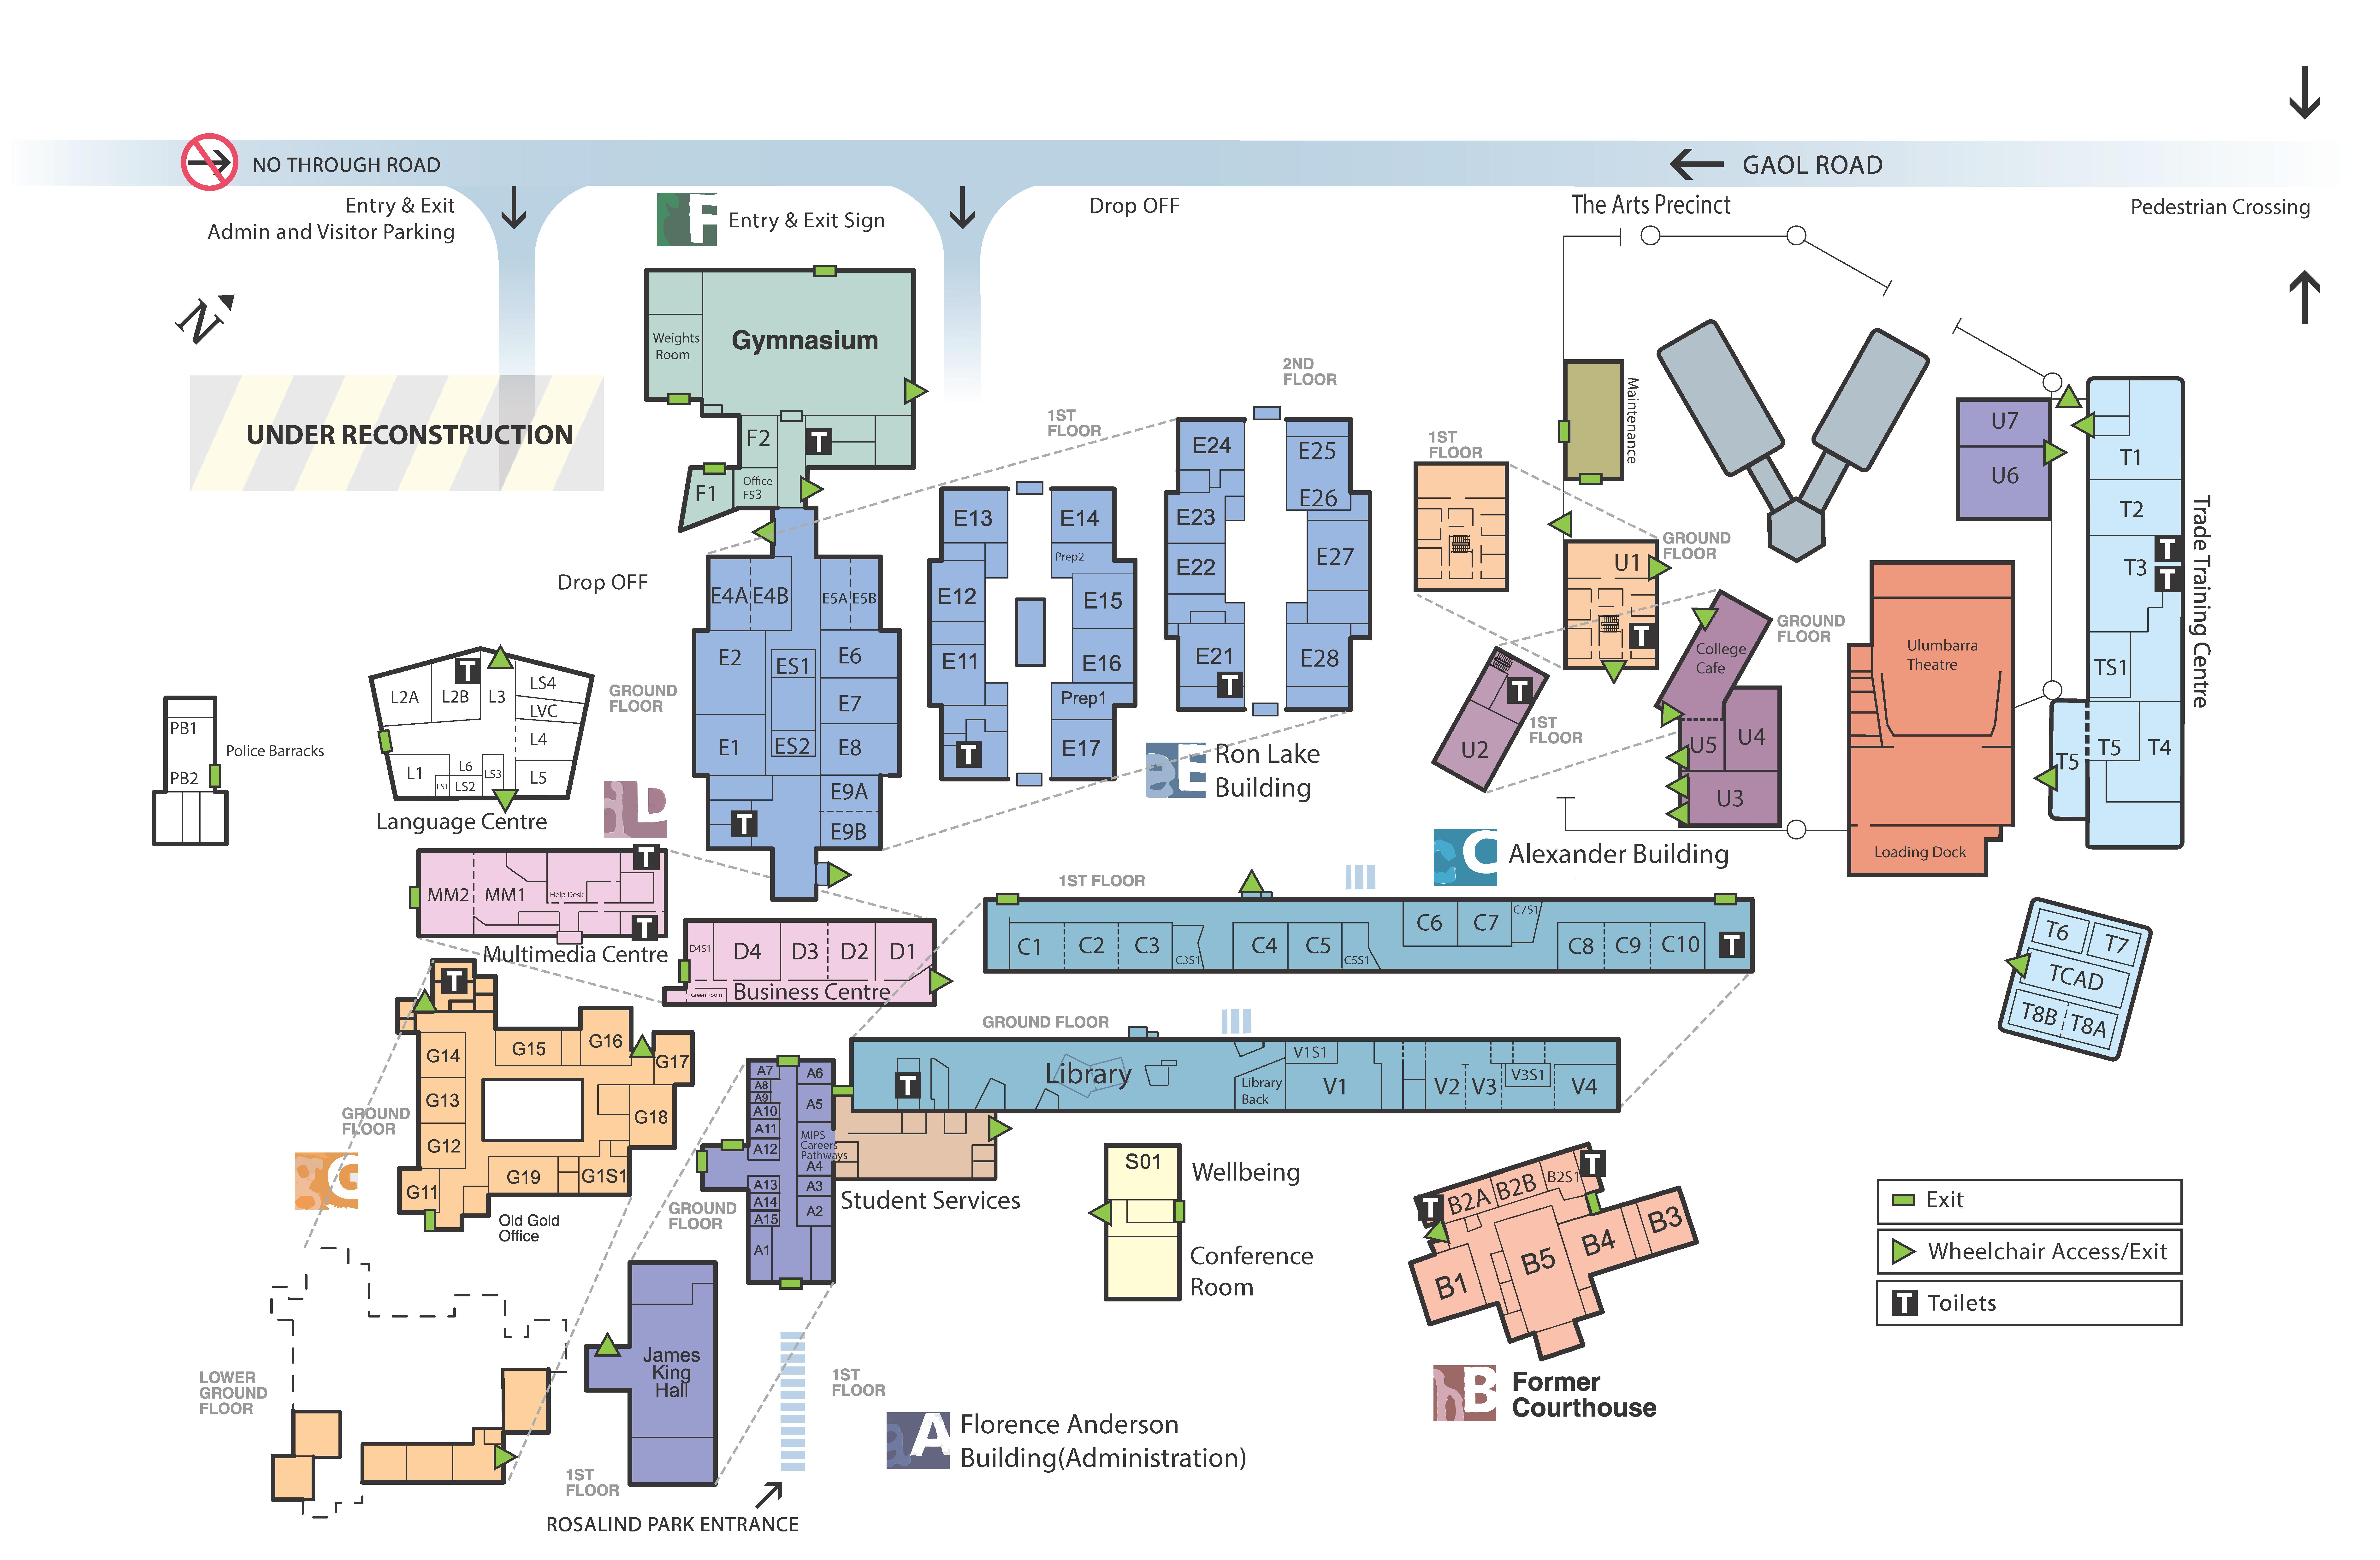 BSSC College Map